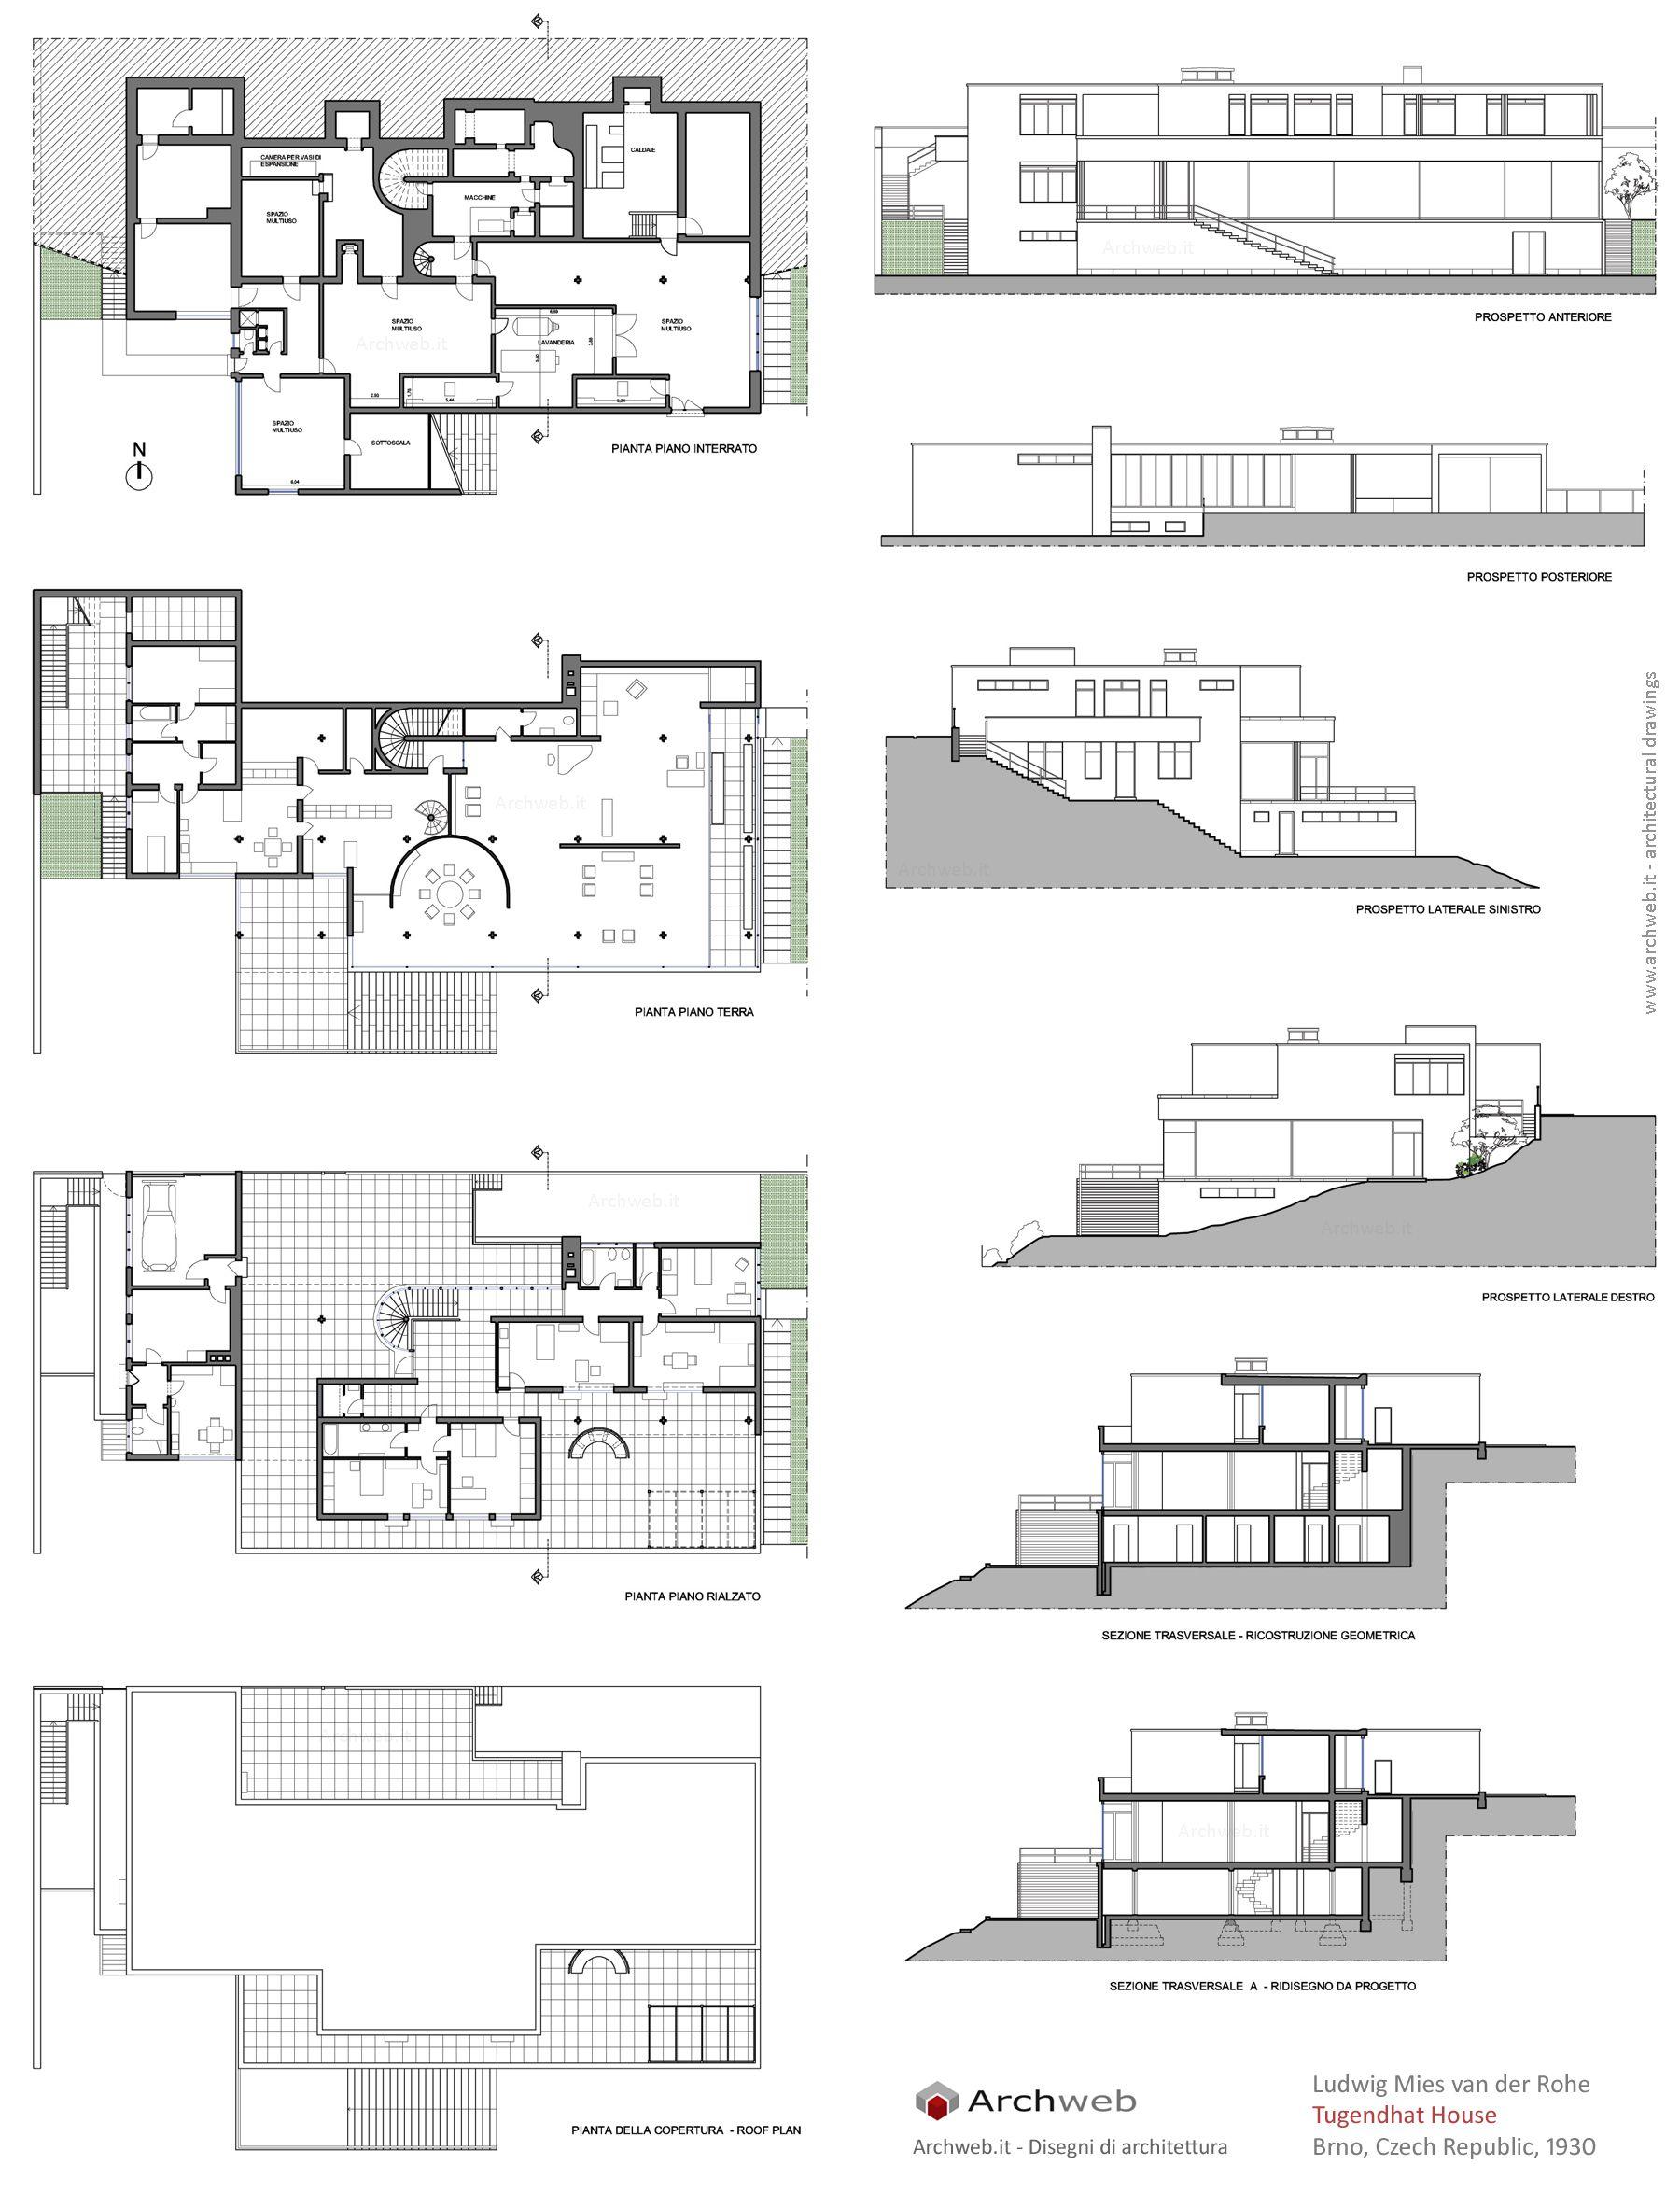 Fiori 3d Archweb.Tugendhat House Drawings Plan Planimetrie Di Case Architettura